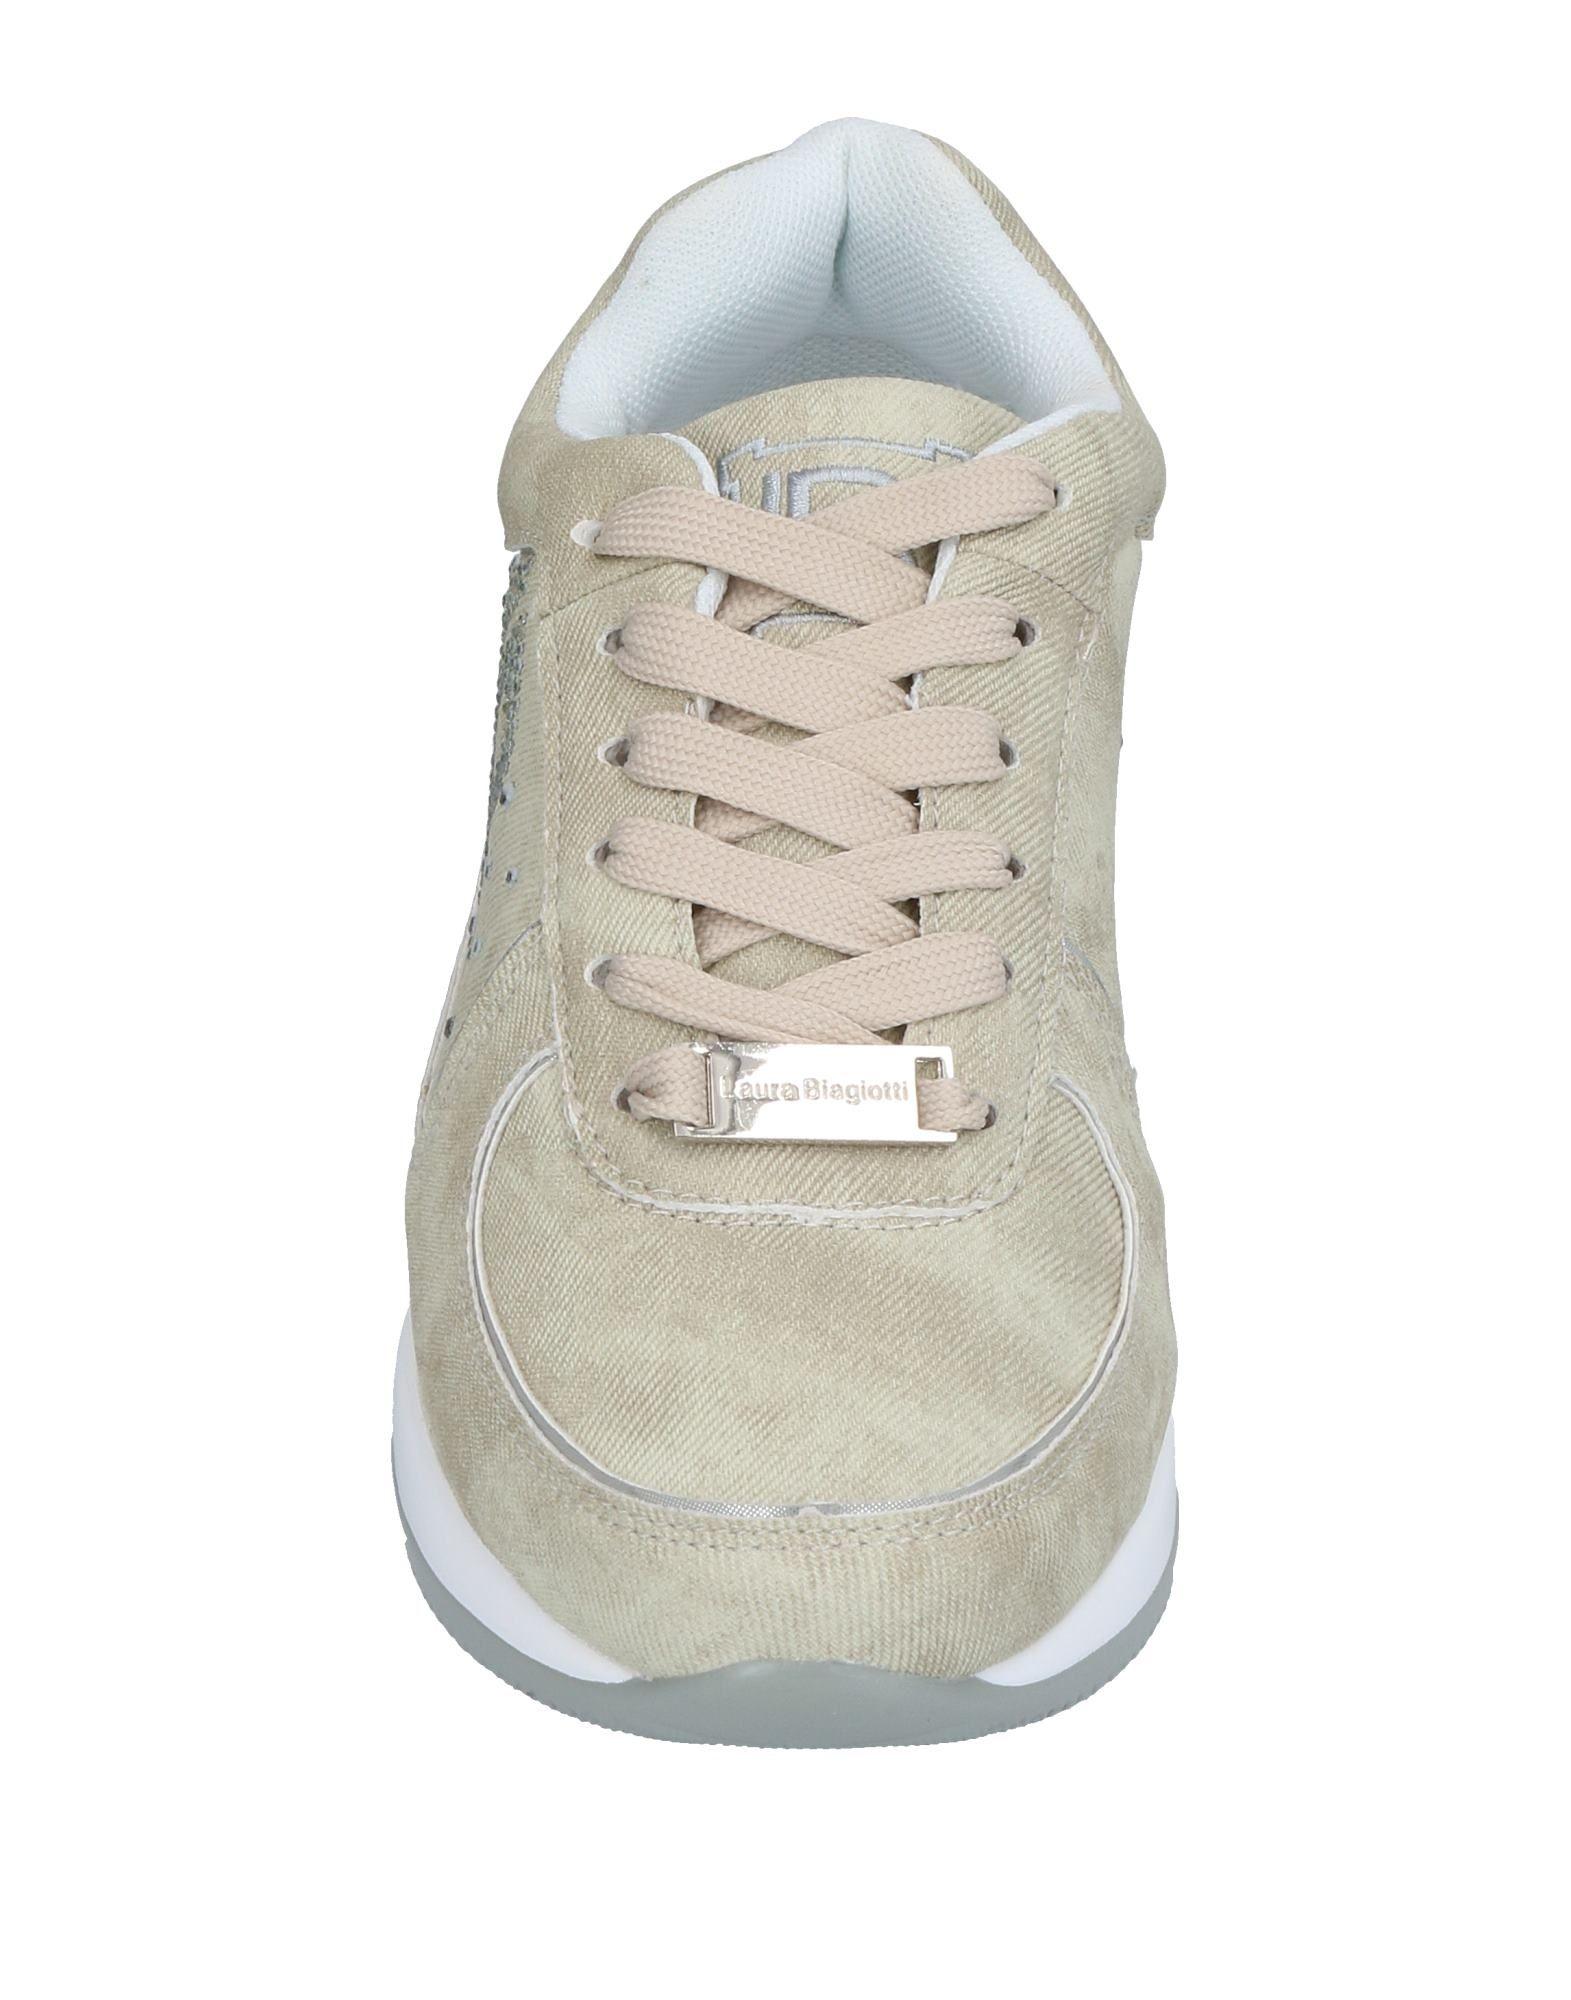 Sneakers Laura Biagiotti Femme - Sneakers Laura Biagiotti sur